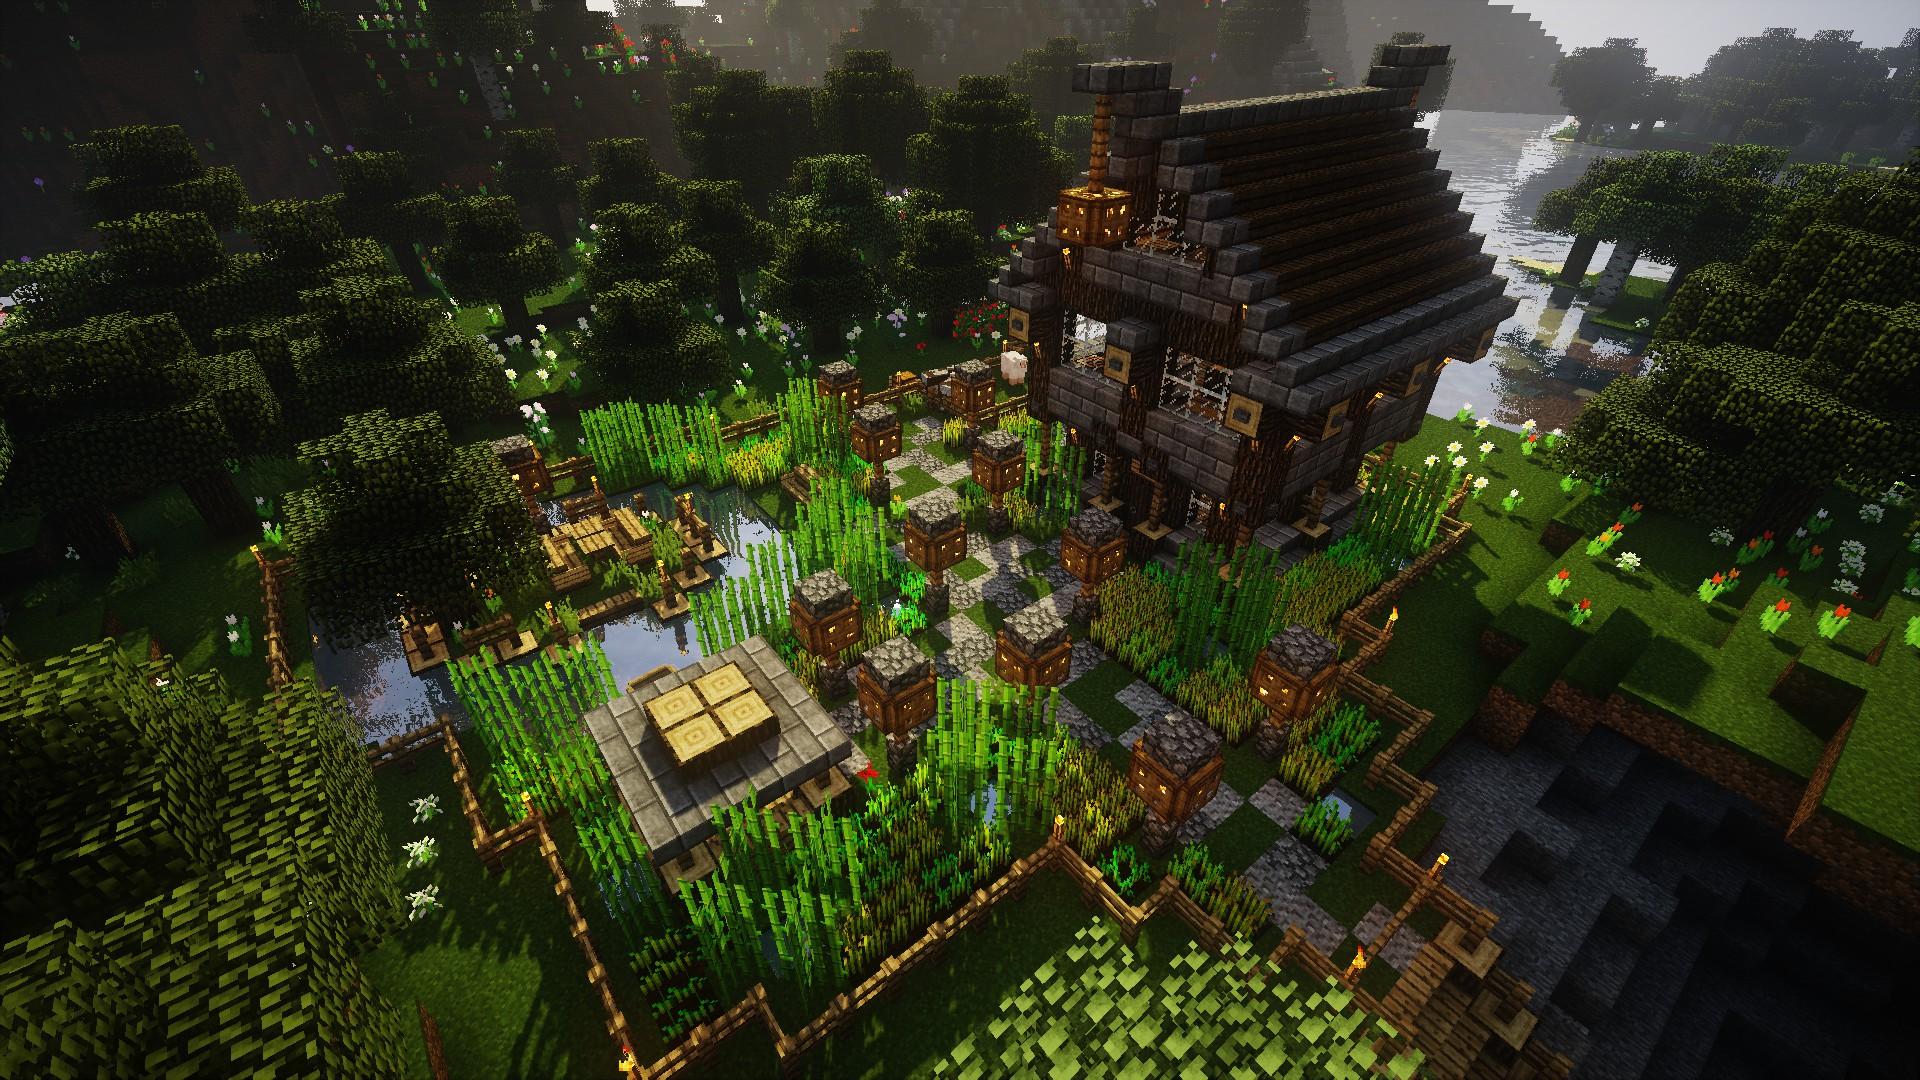 Fondos De Pantalla Minecraft Videojuegos Granja Casa